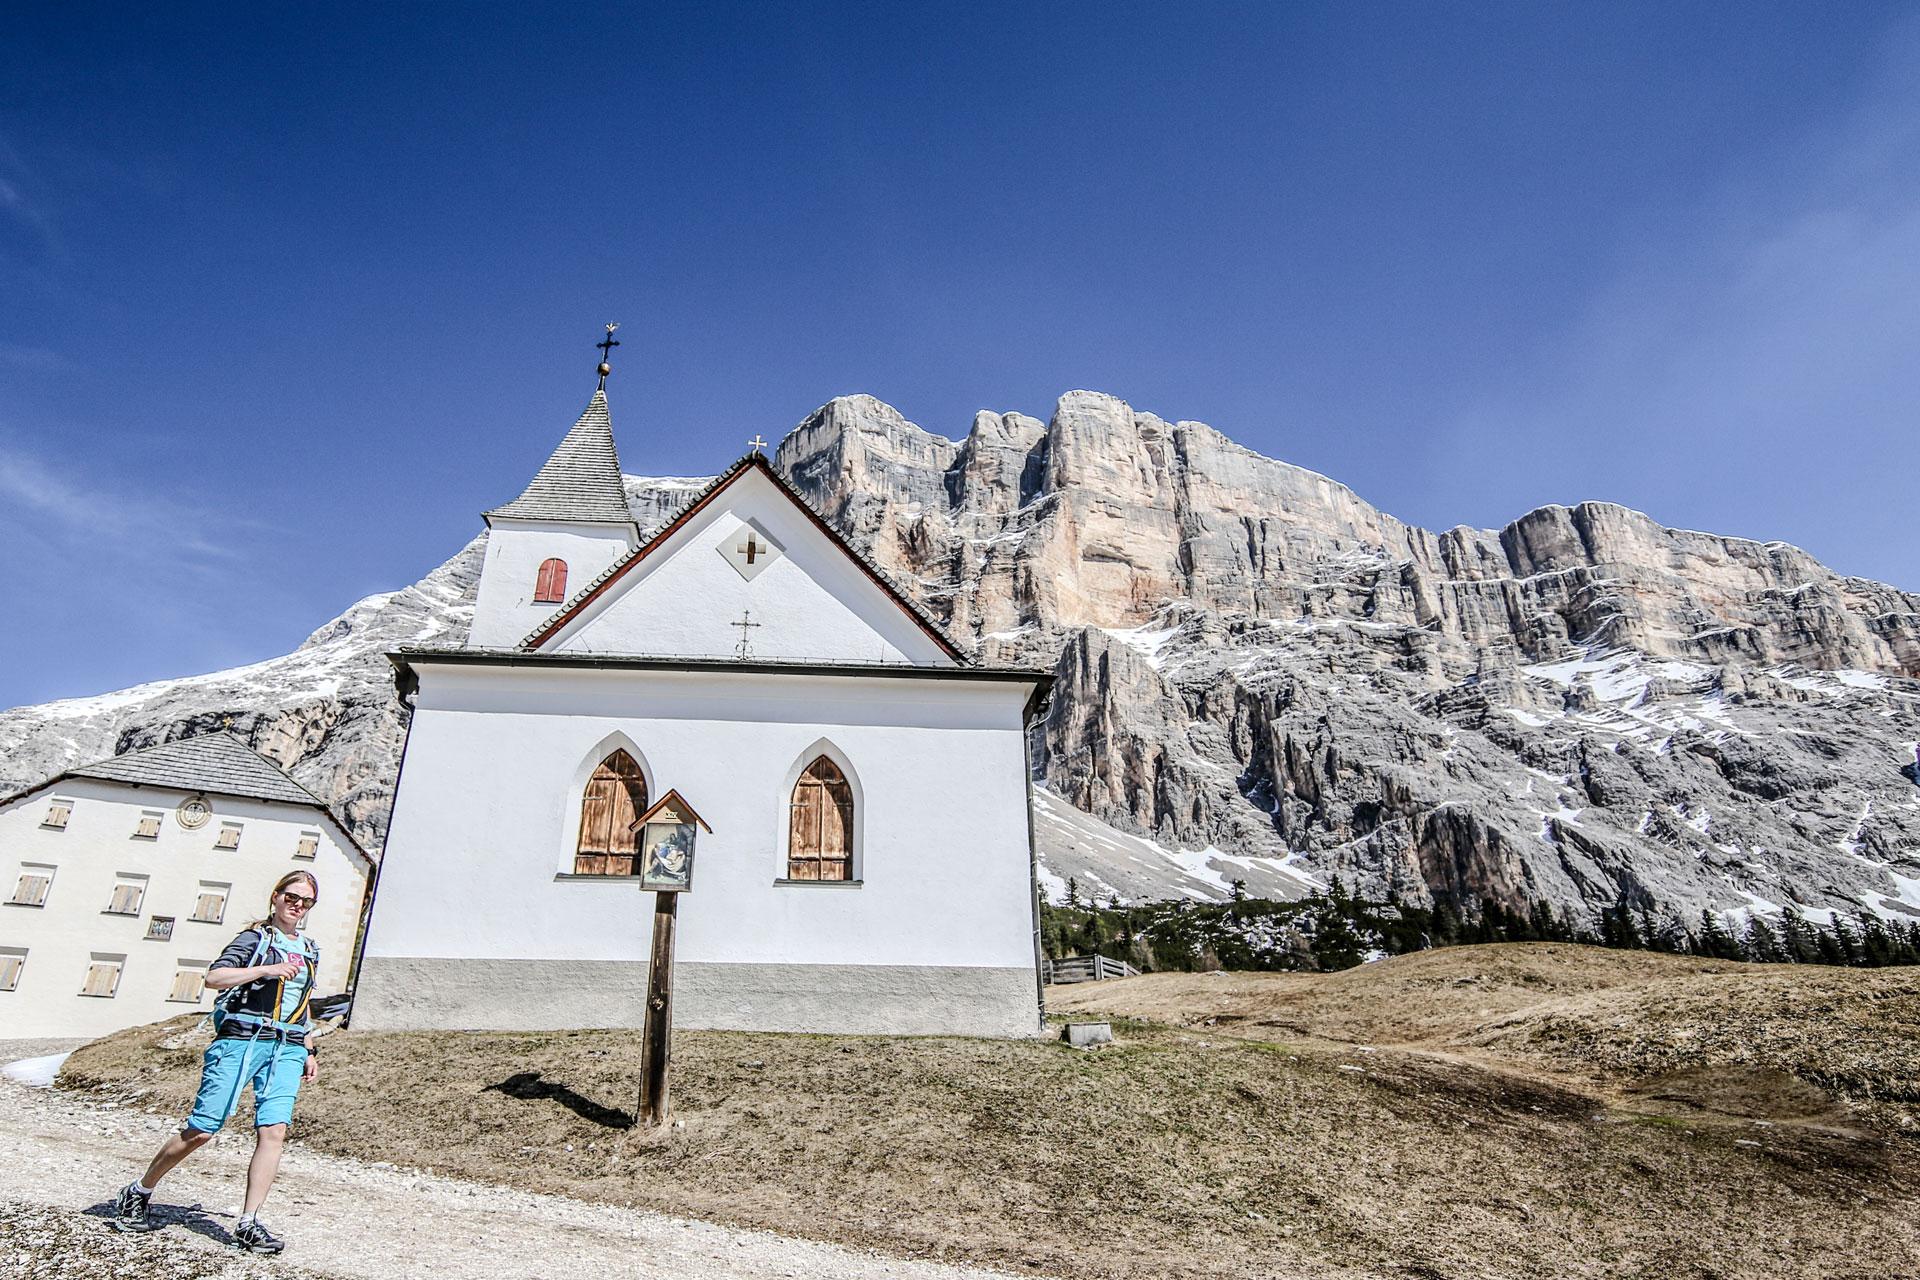 wp-content/uploads/itineraries/Dolomites/stores-hiking-2.jpg